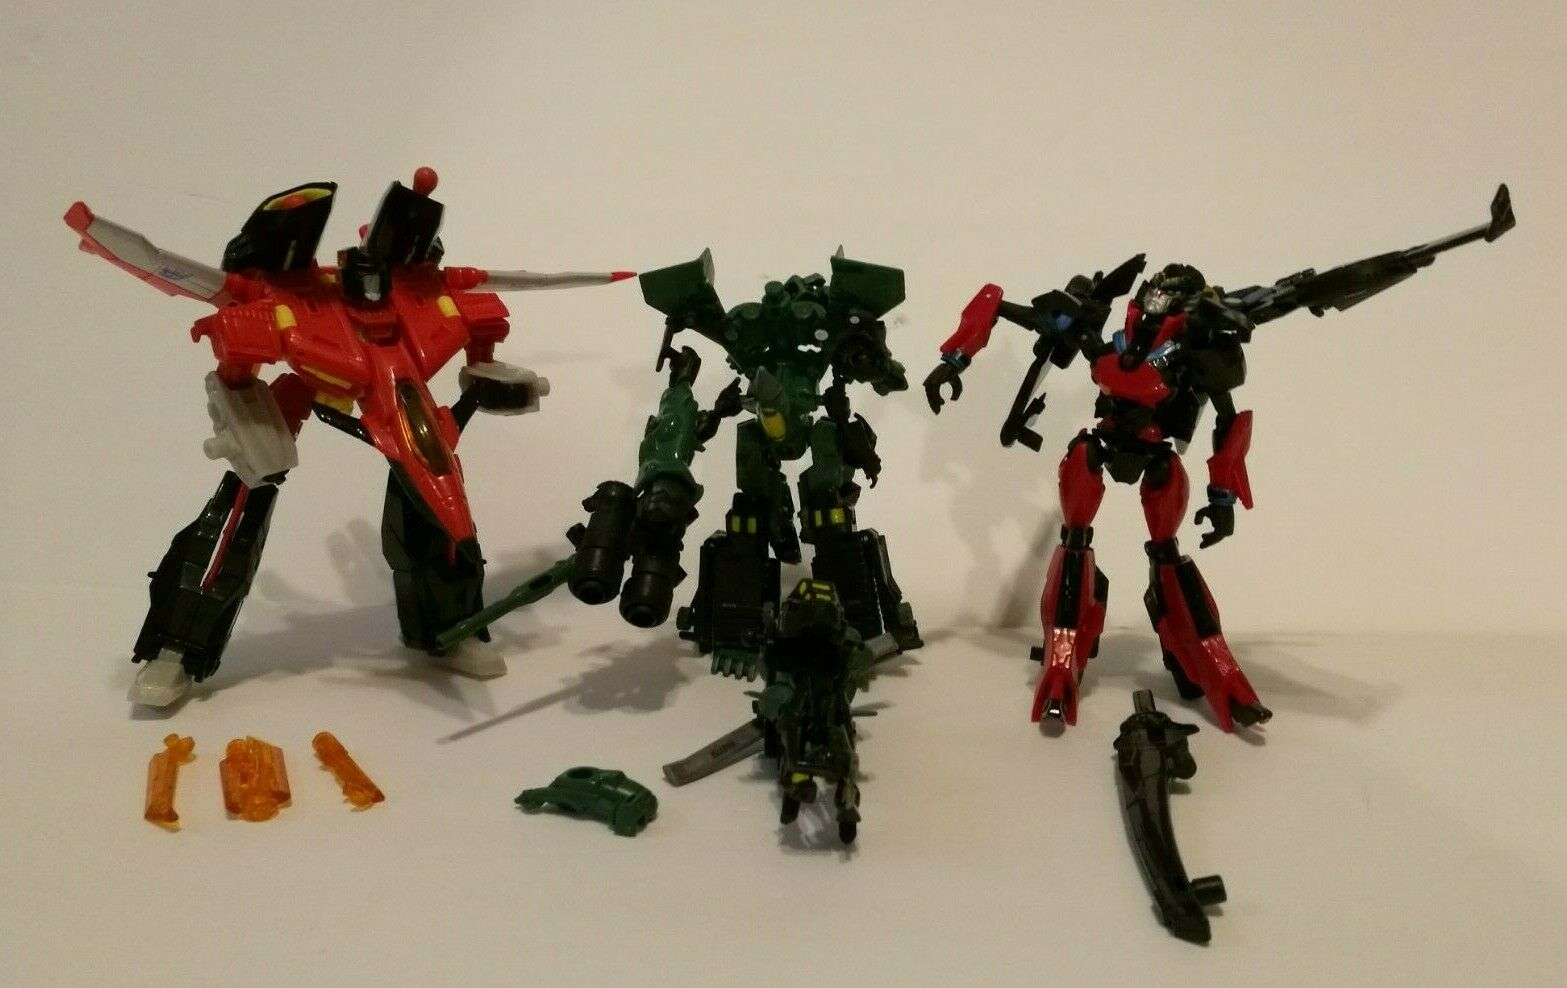 Three Transformers Generations WINDBLADE STARSCREAM MINI-CON ASSAULT TEAM